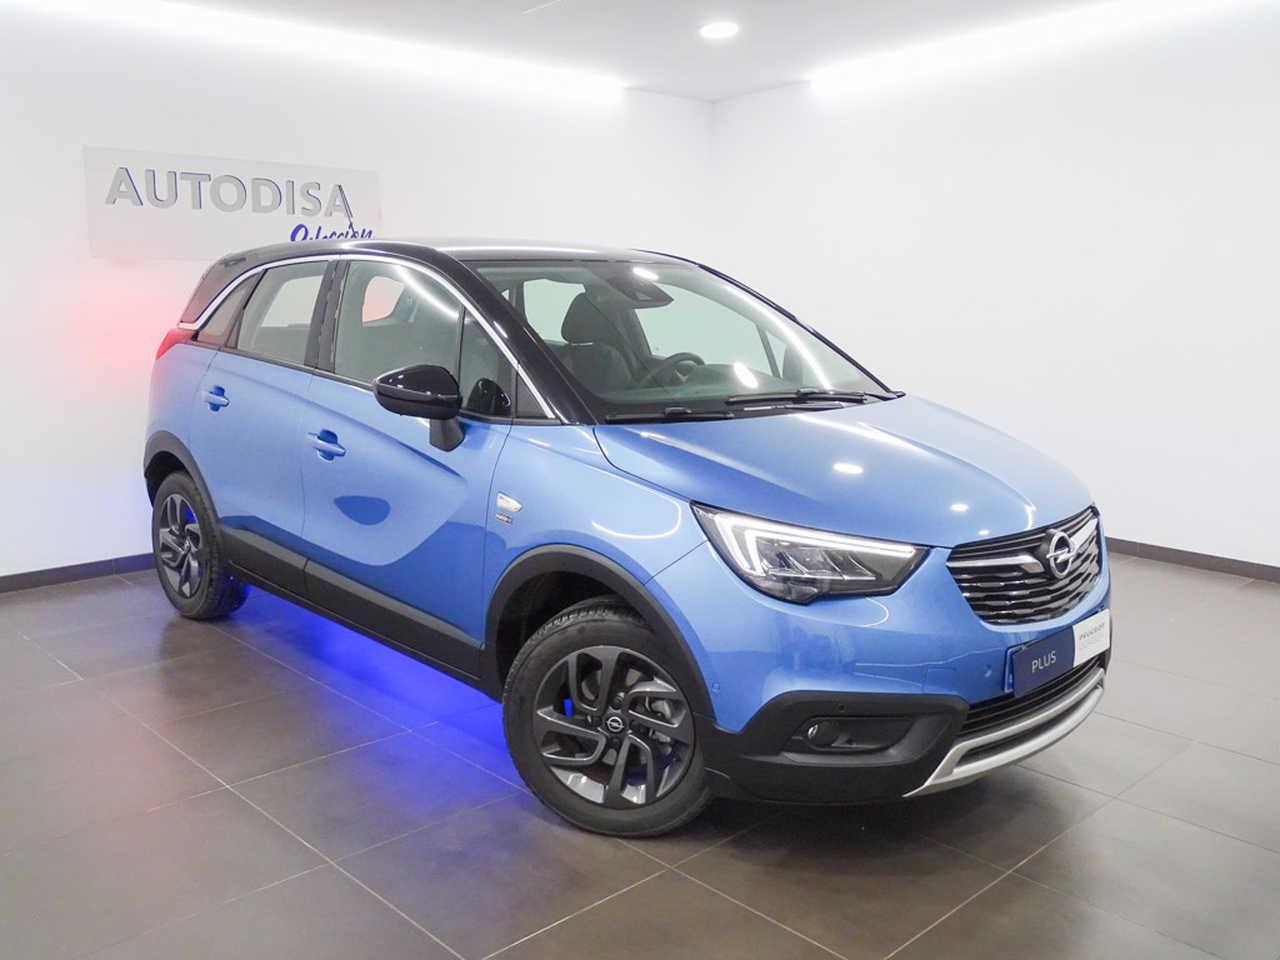 Opel Crossland X CLX 1.2 2020